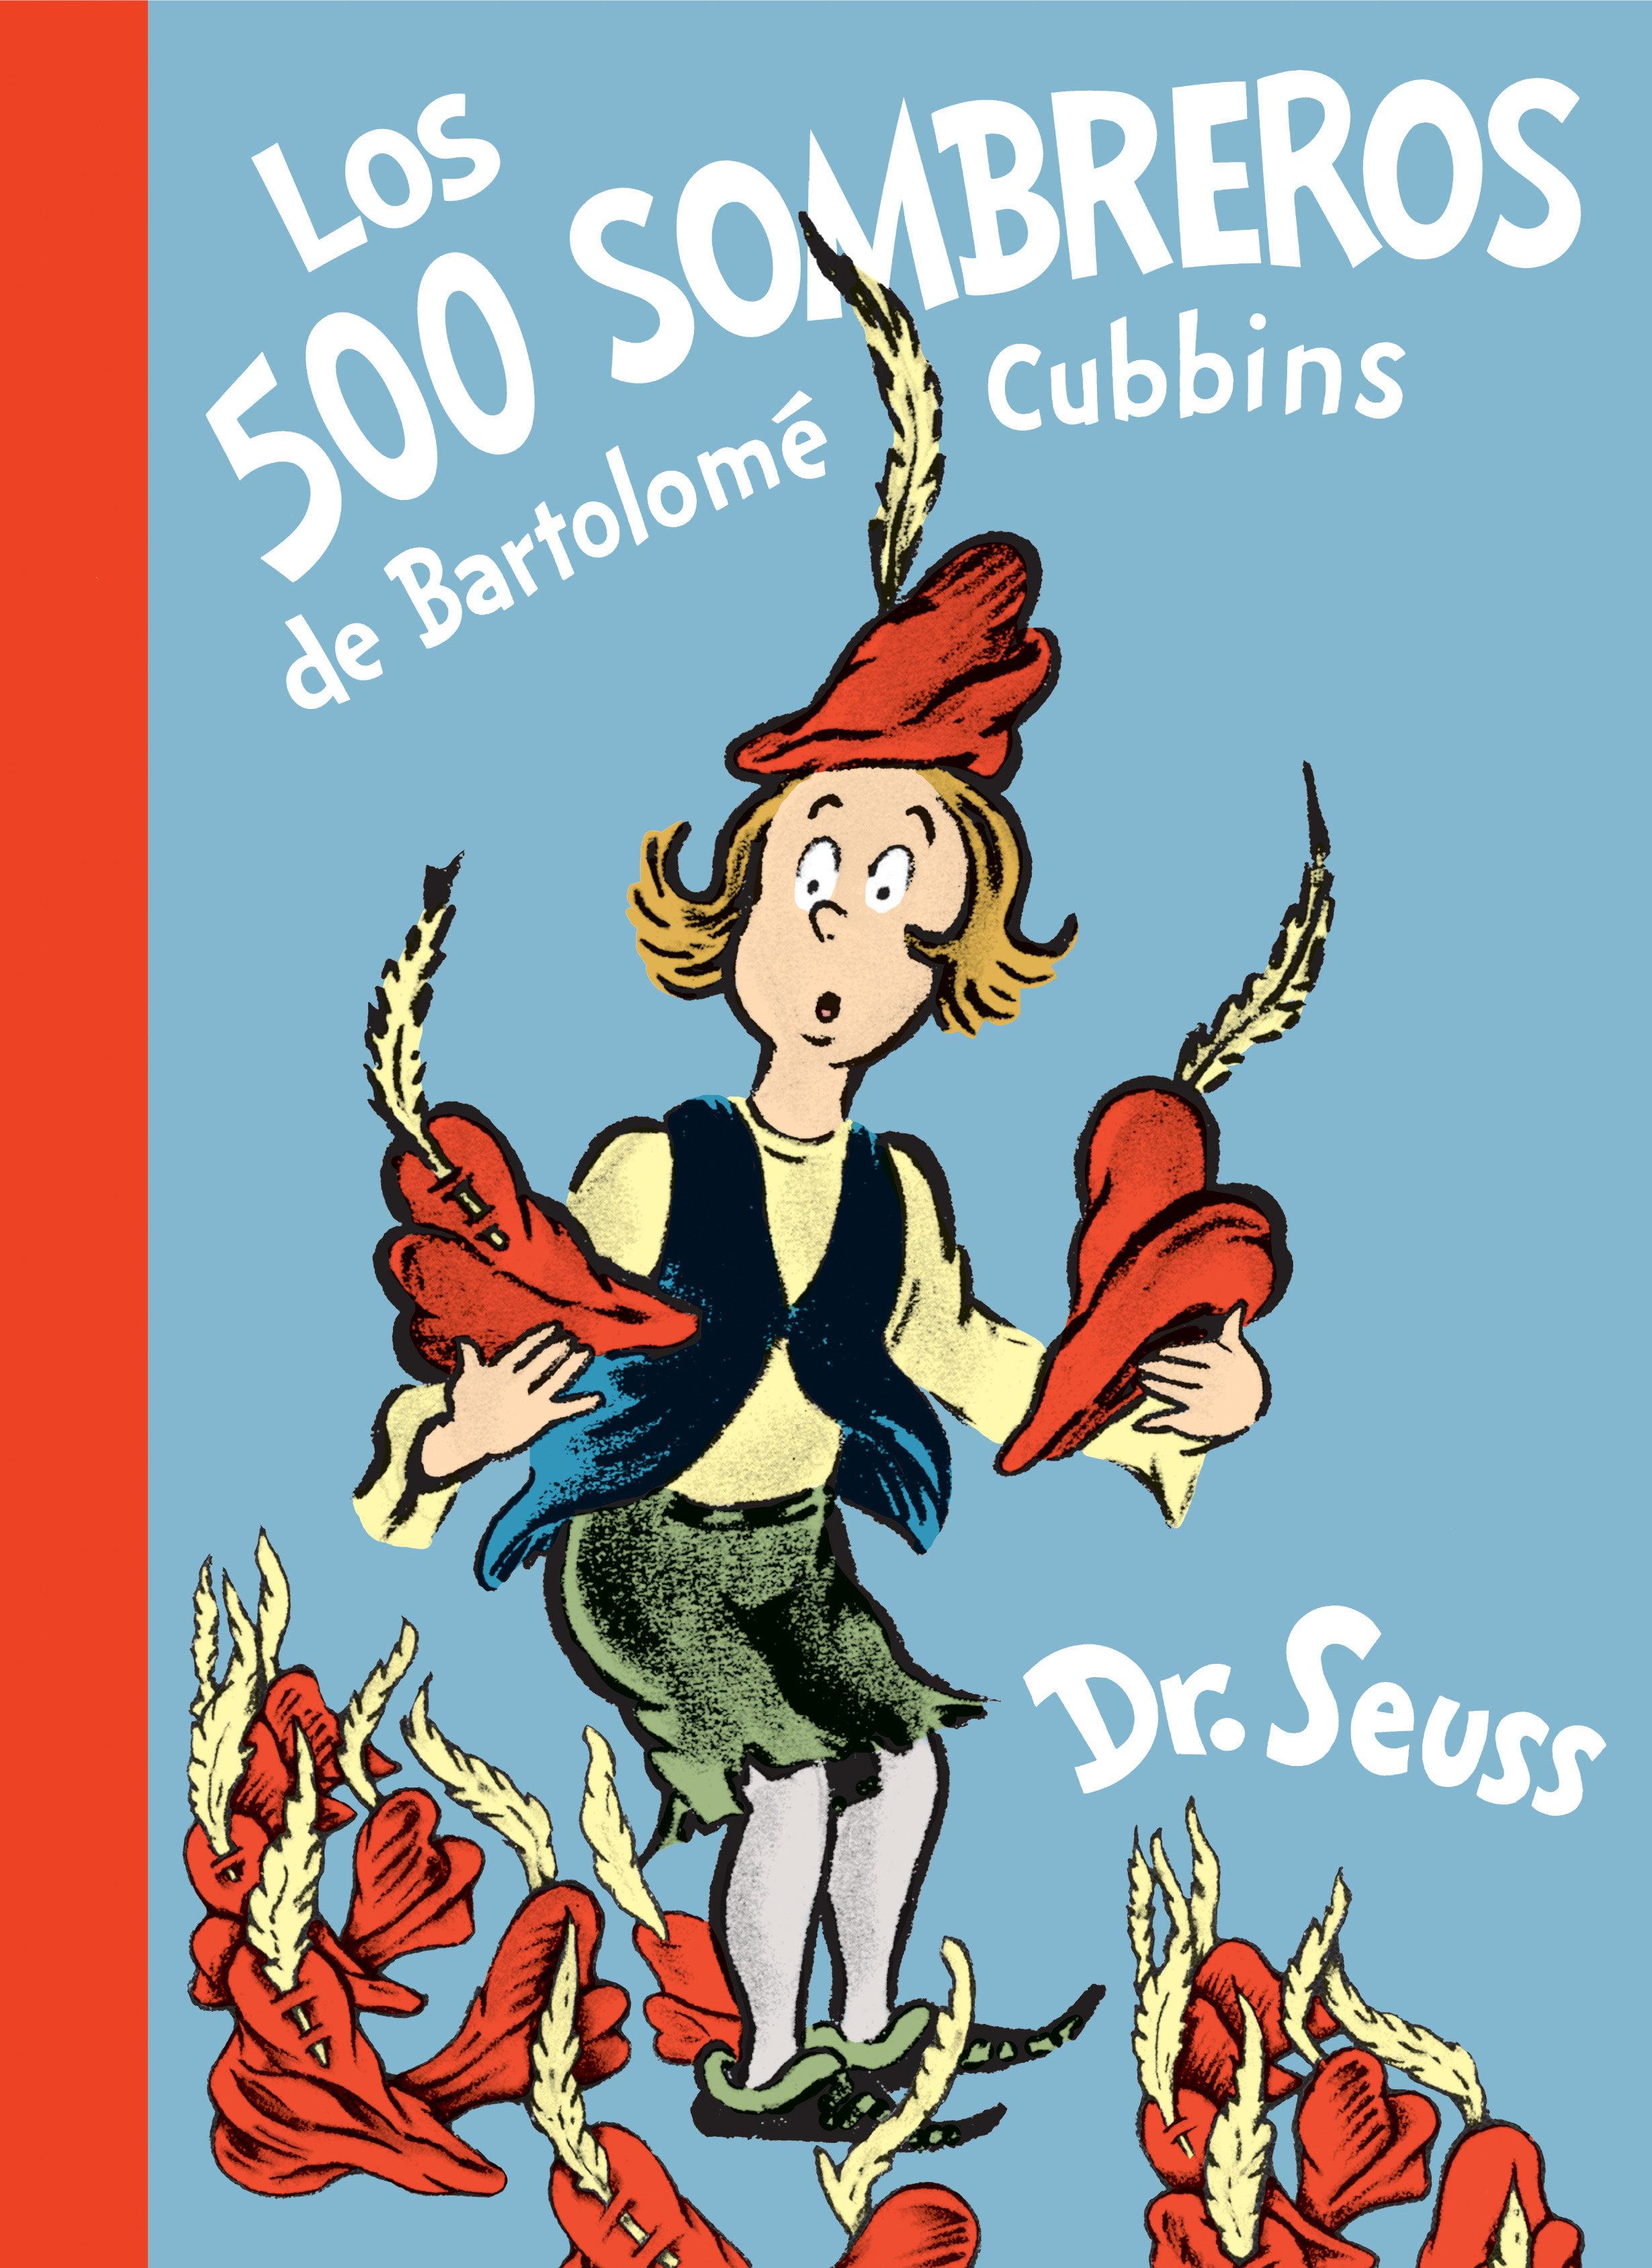 Los 500 sombreros de Bartolomé Cubbins (The 500 Hats of Bartholomew Cubbins Spanish  Edition)